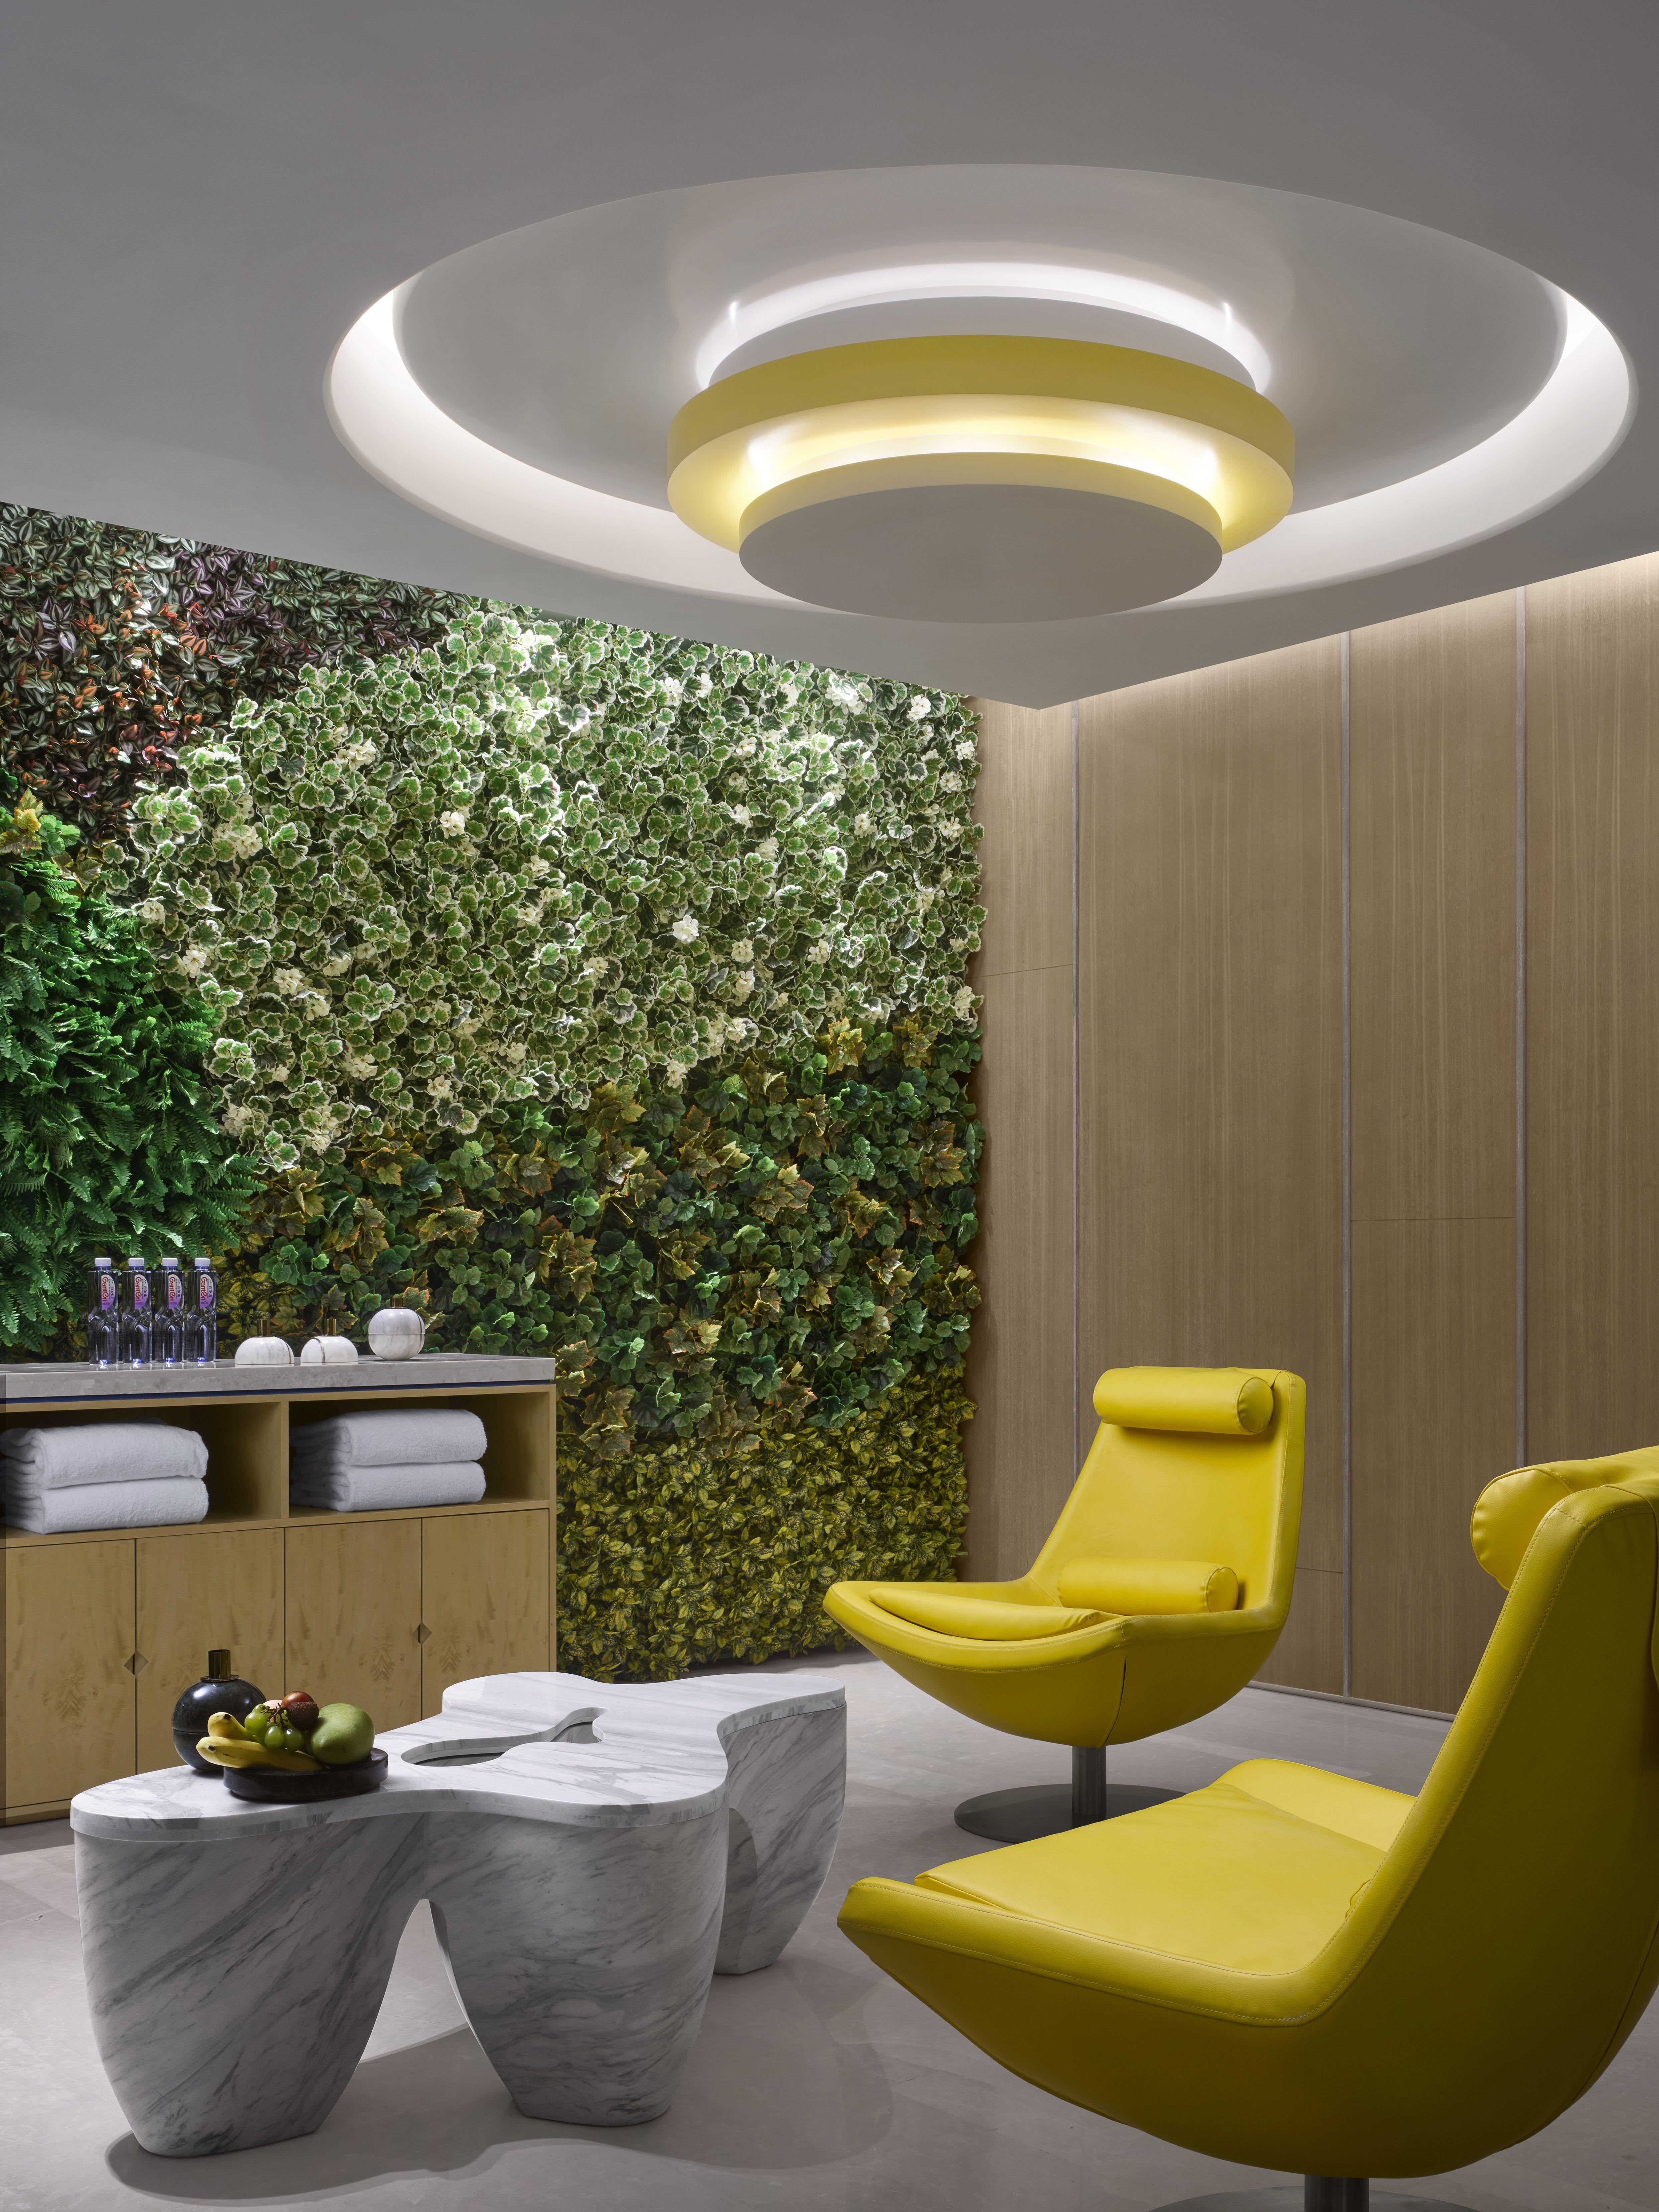 Artyzen sifang by hirsch bedner associates hba ikea interior styling also best images nanjing bath shower screens tub rh pinterest